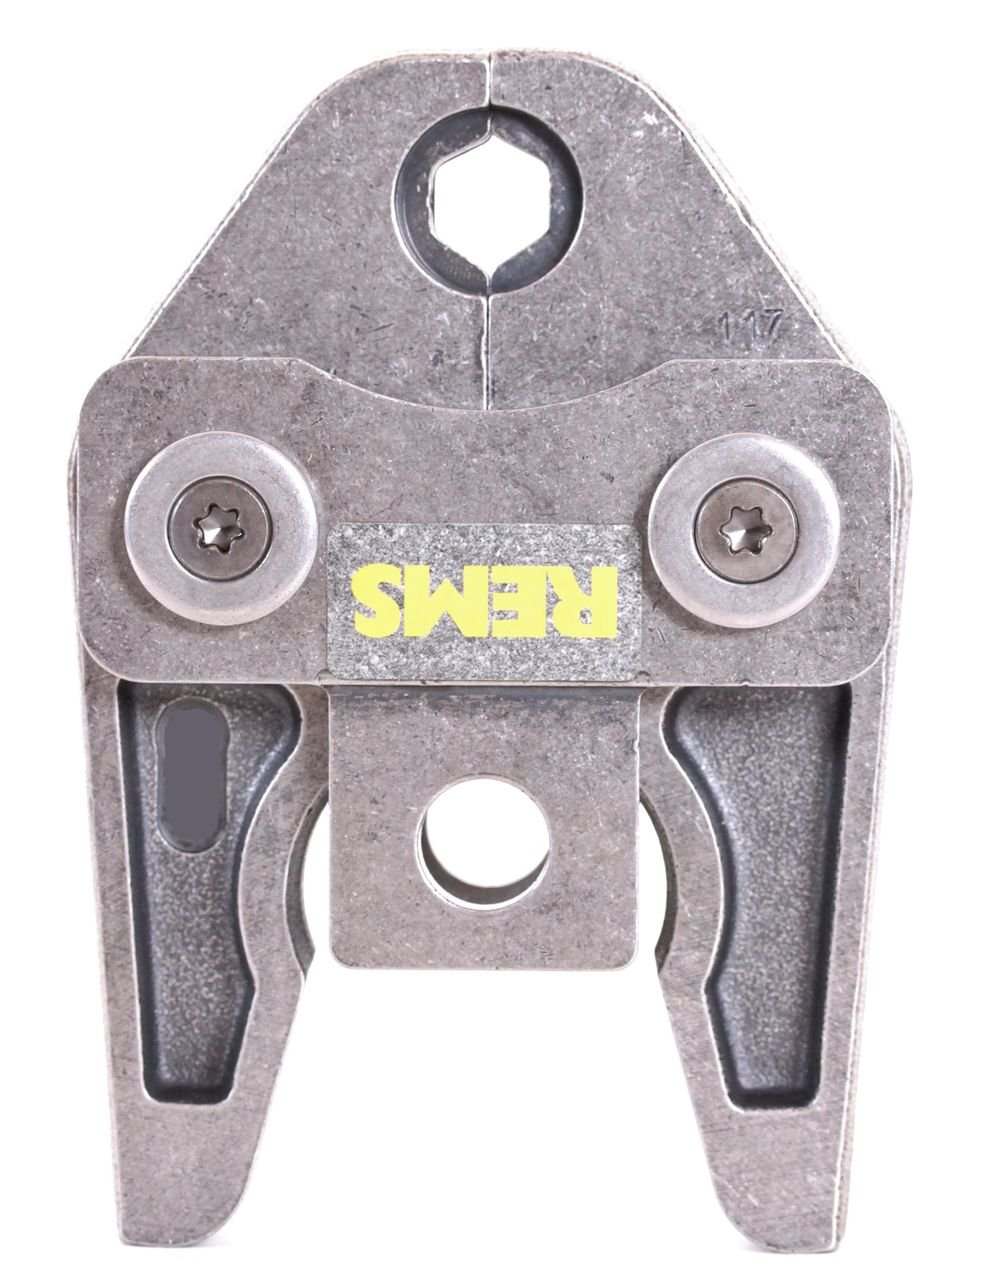 Rems 570125 Pince /à sertir Profil V 18 mm